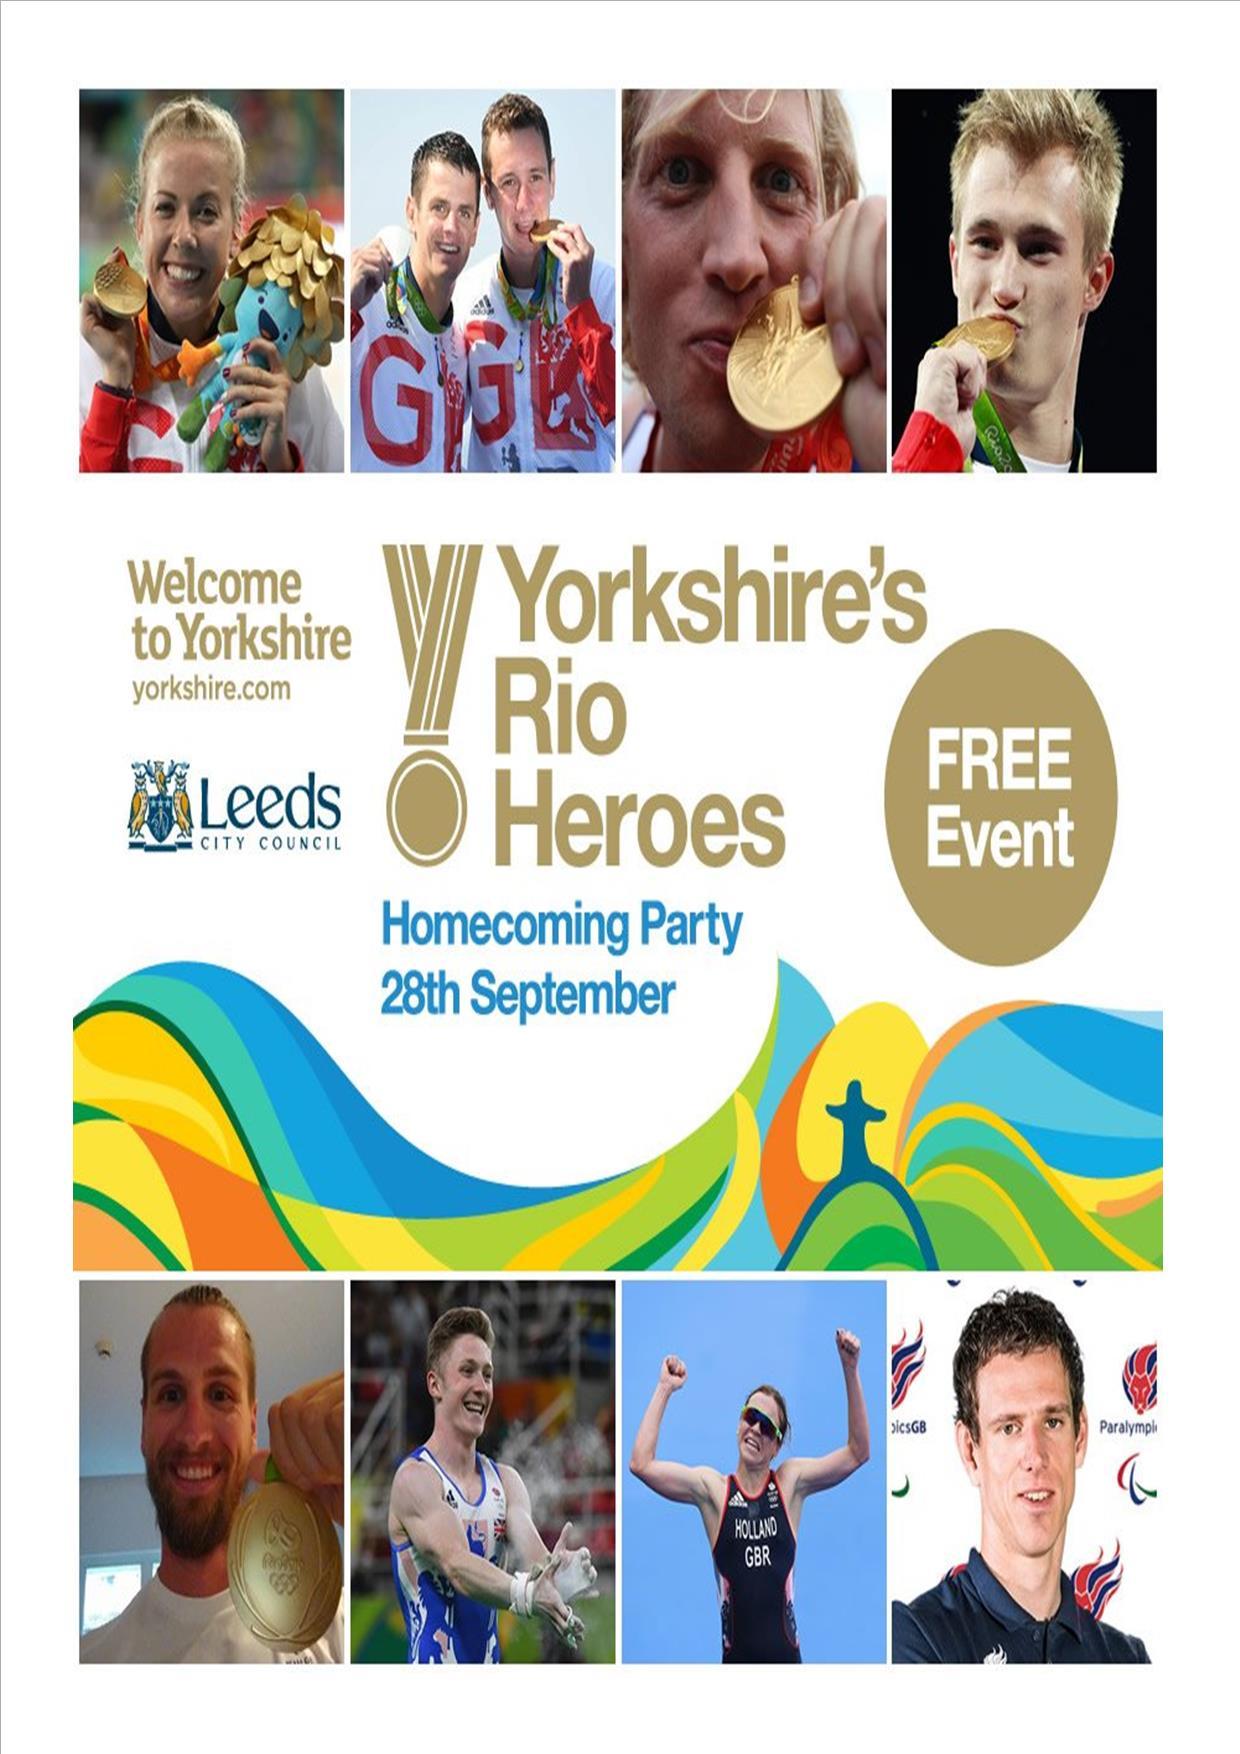 Yorkshire Rio Heroes